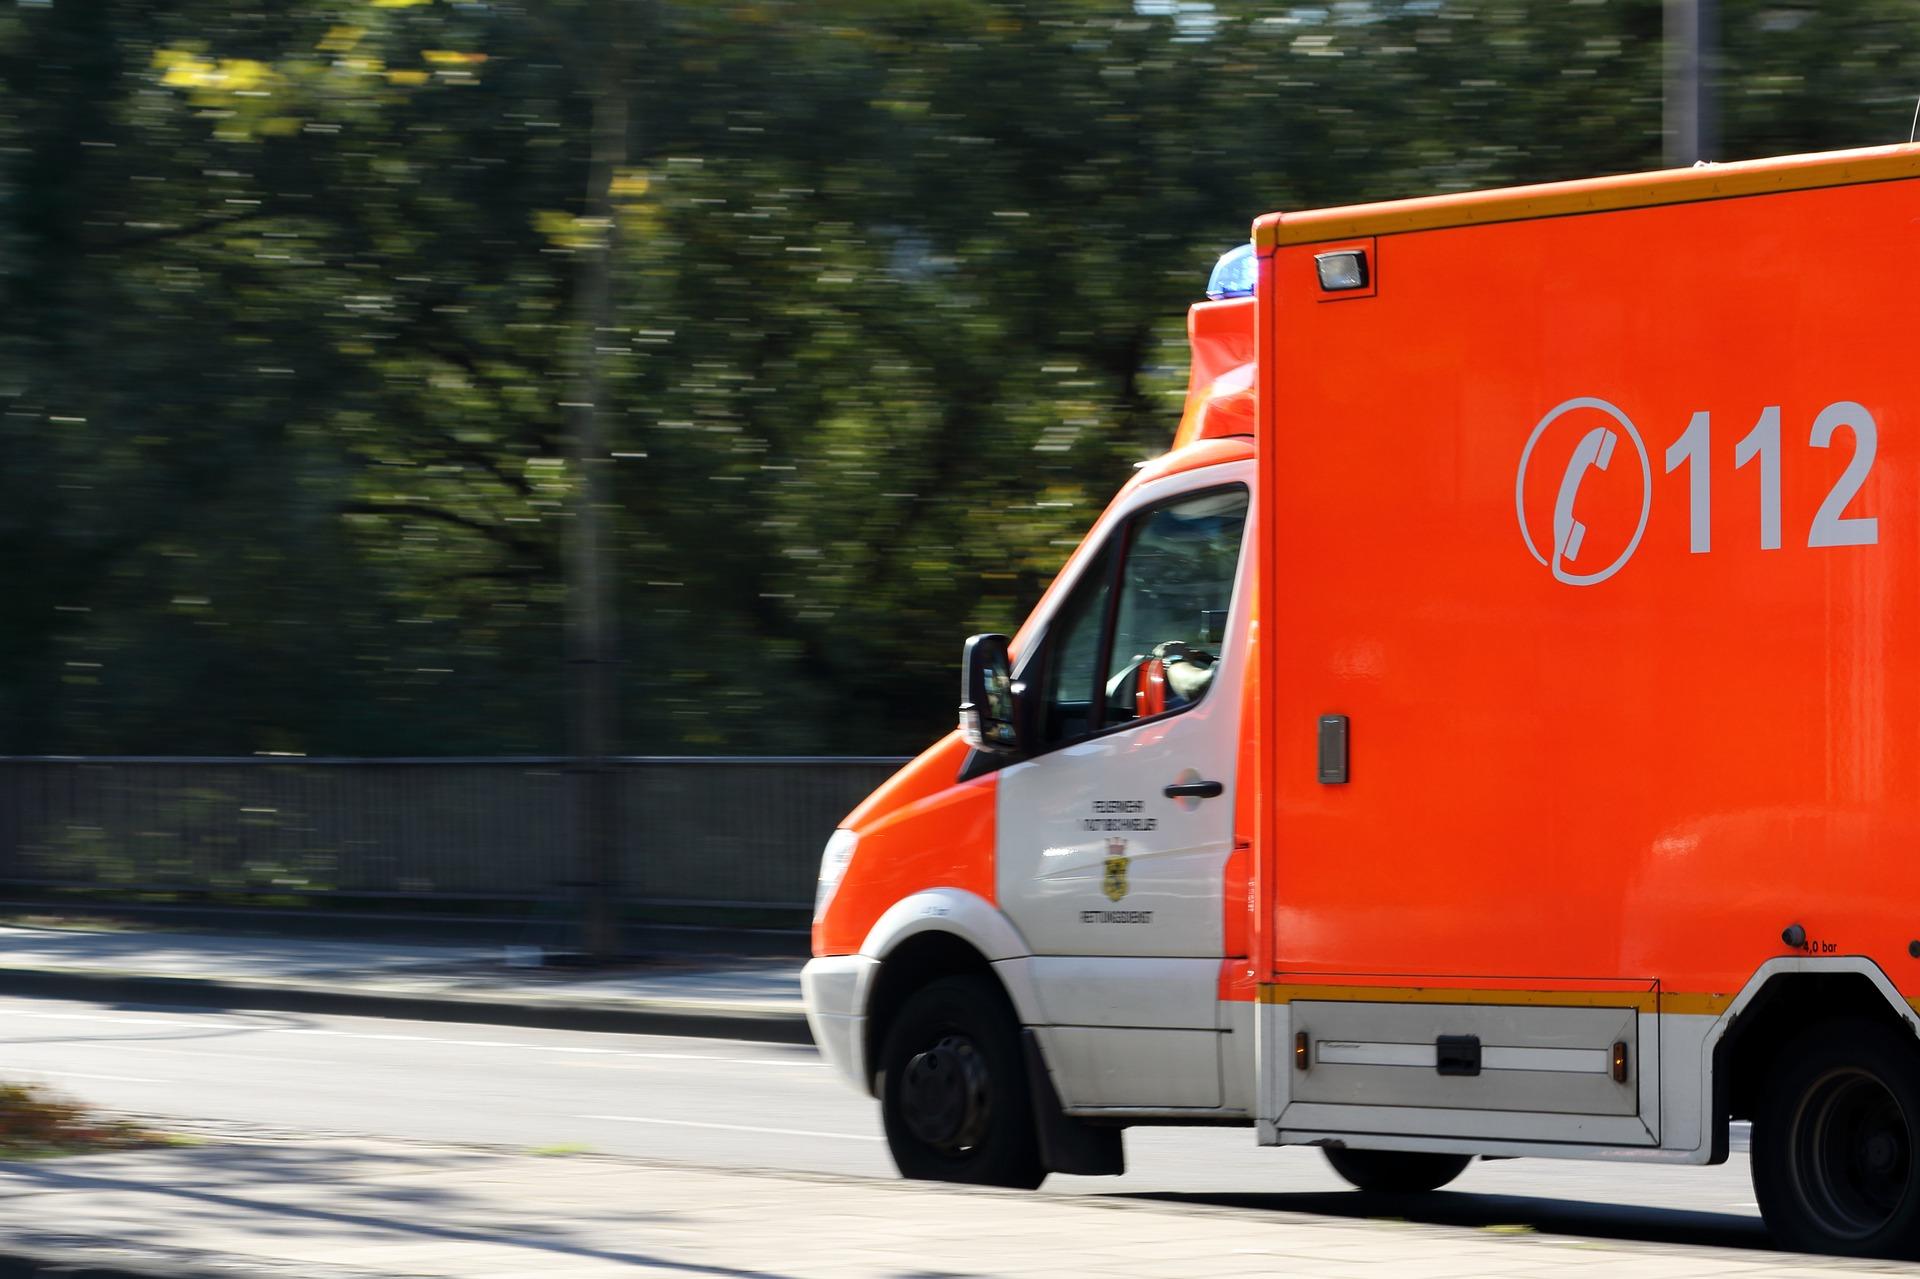 ambulance-970037_1920.jpg